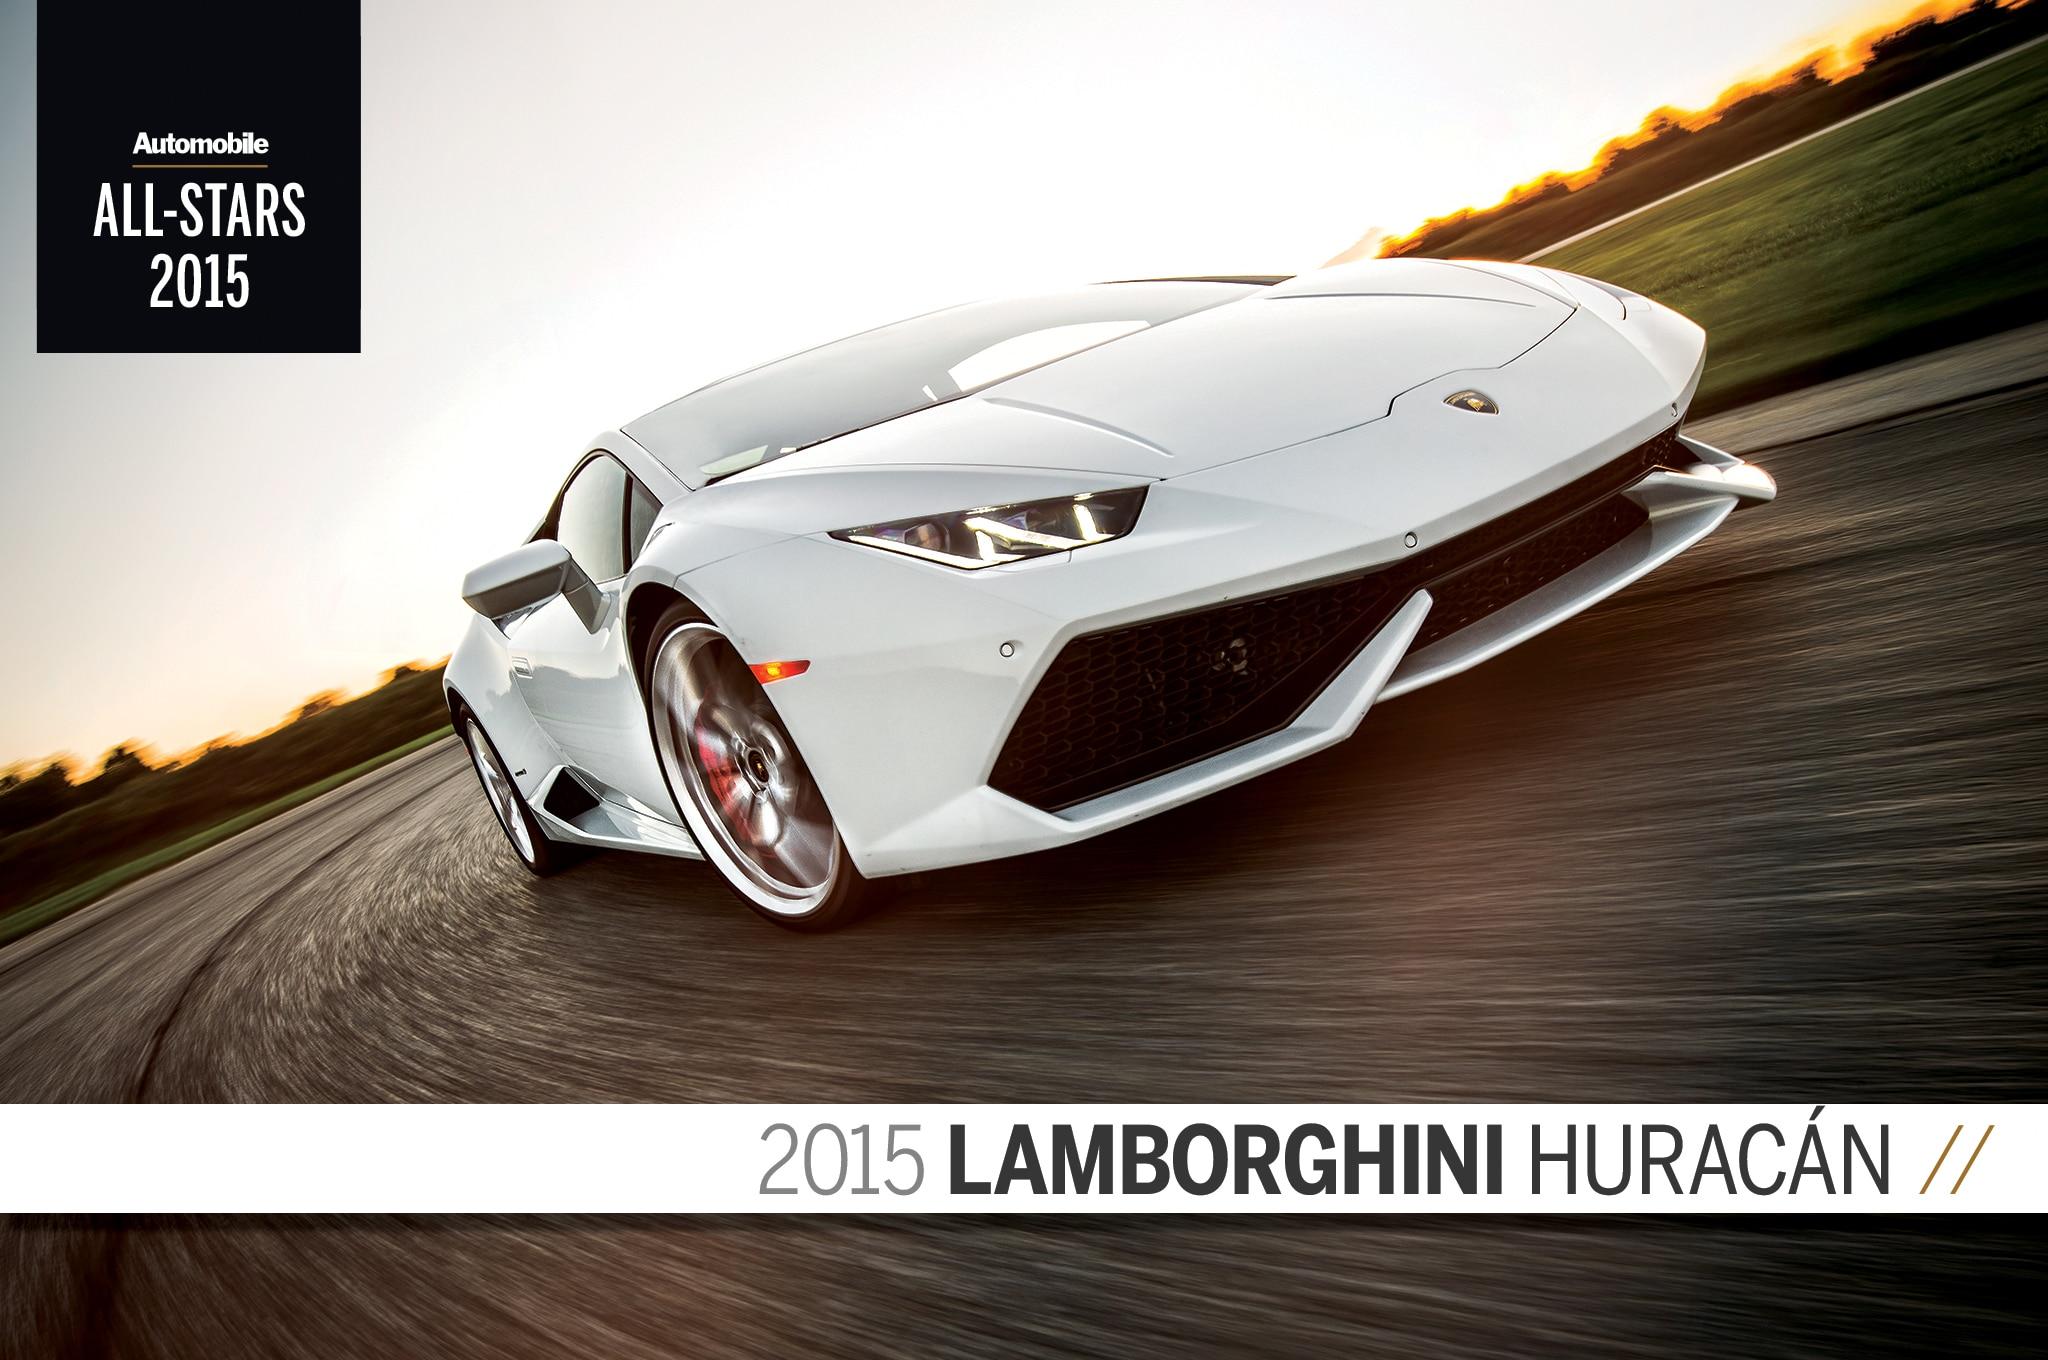 All Stars 2015 Lamborghini Huracan Final